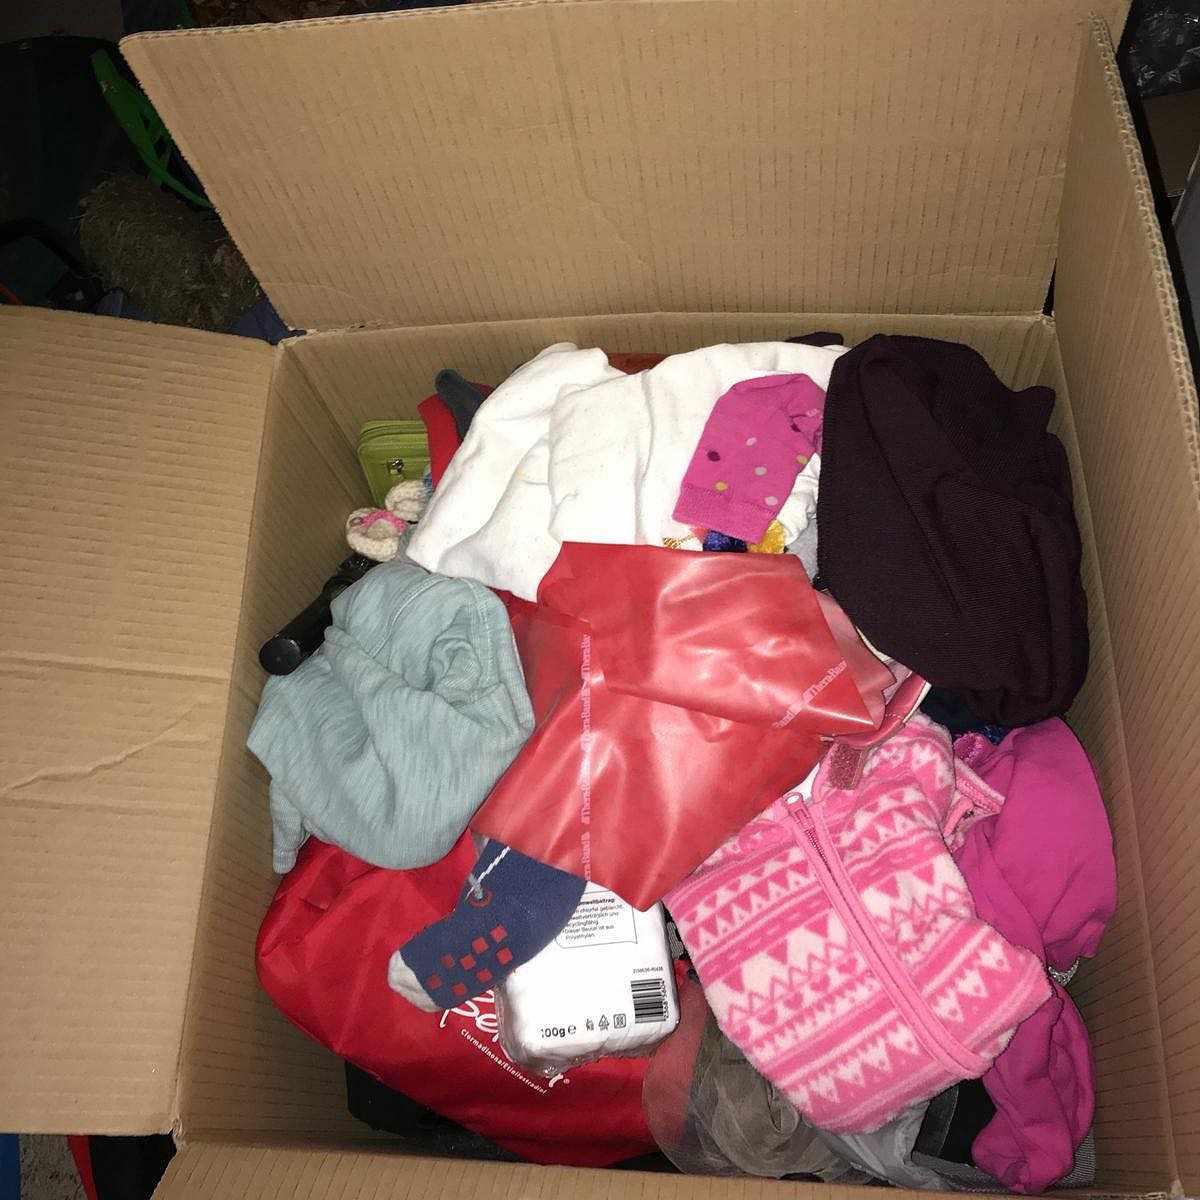 image of Cardboard, clothes, Garde - Stocksund